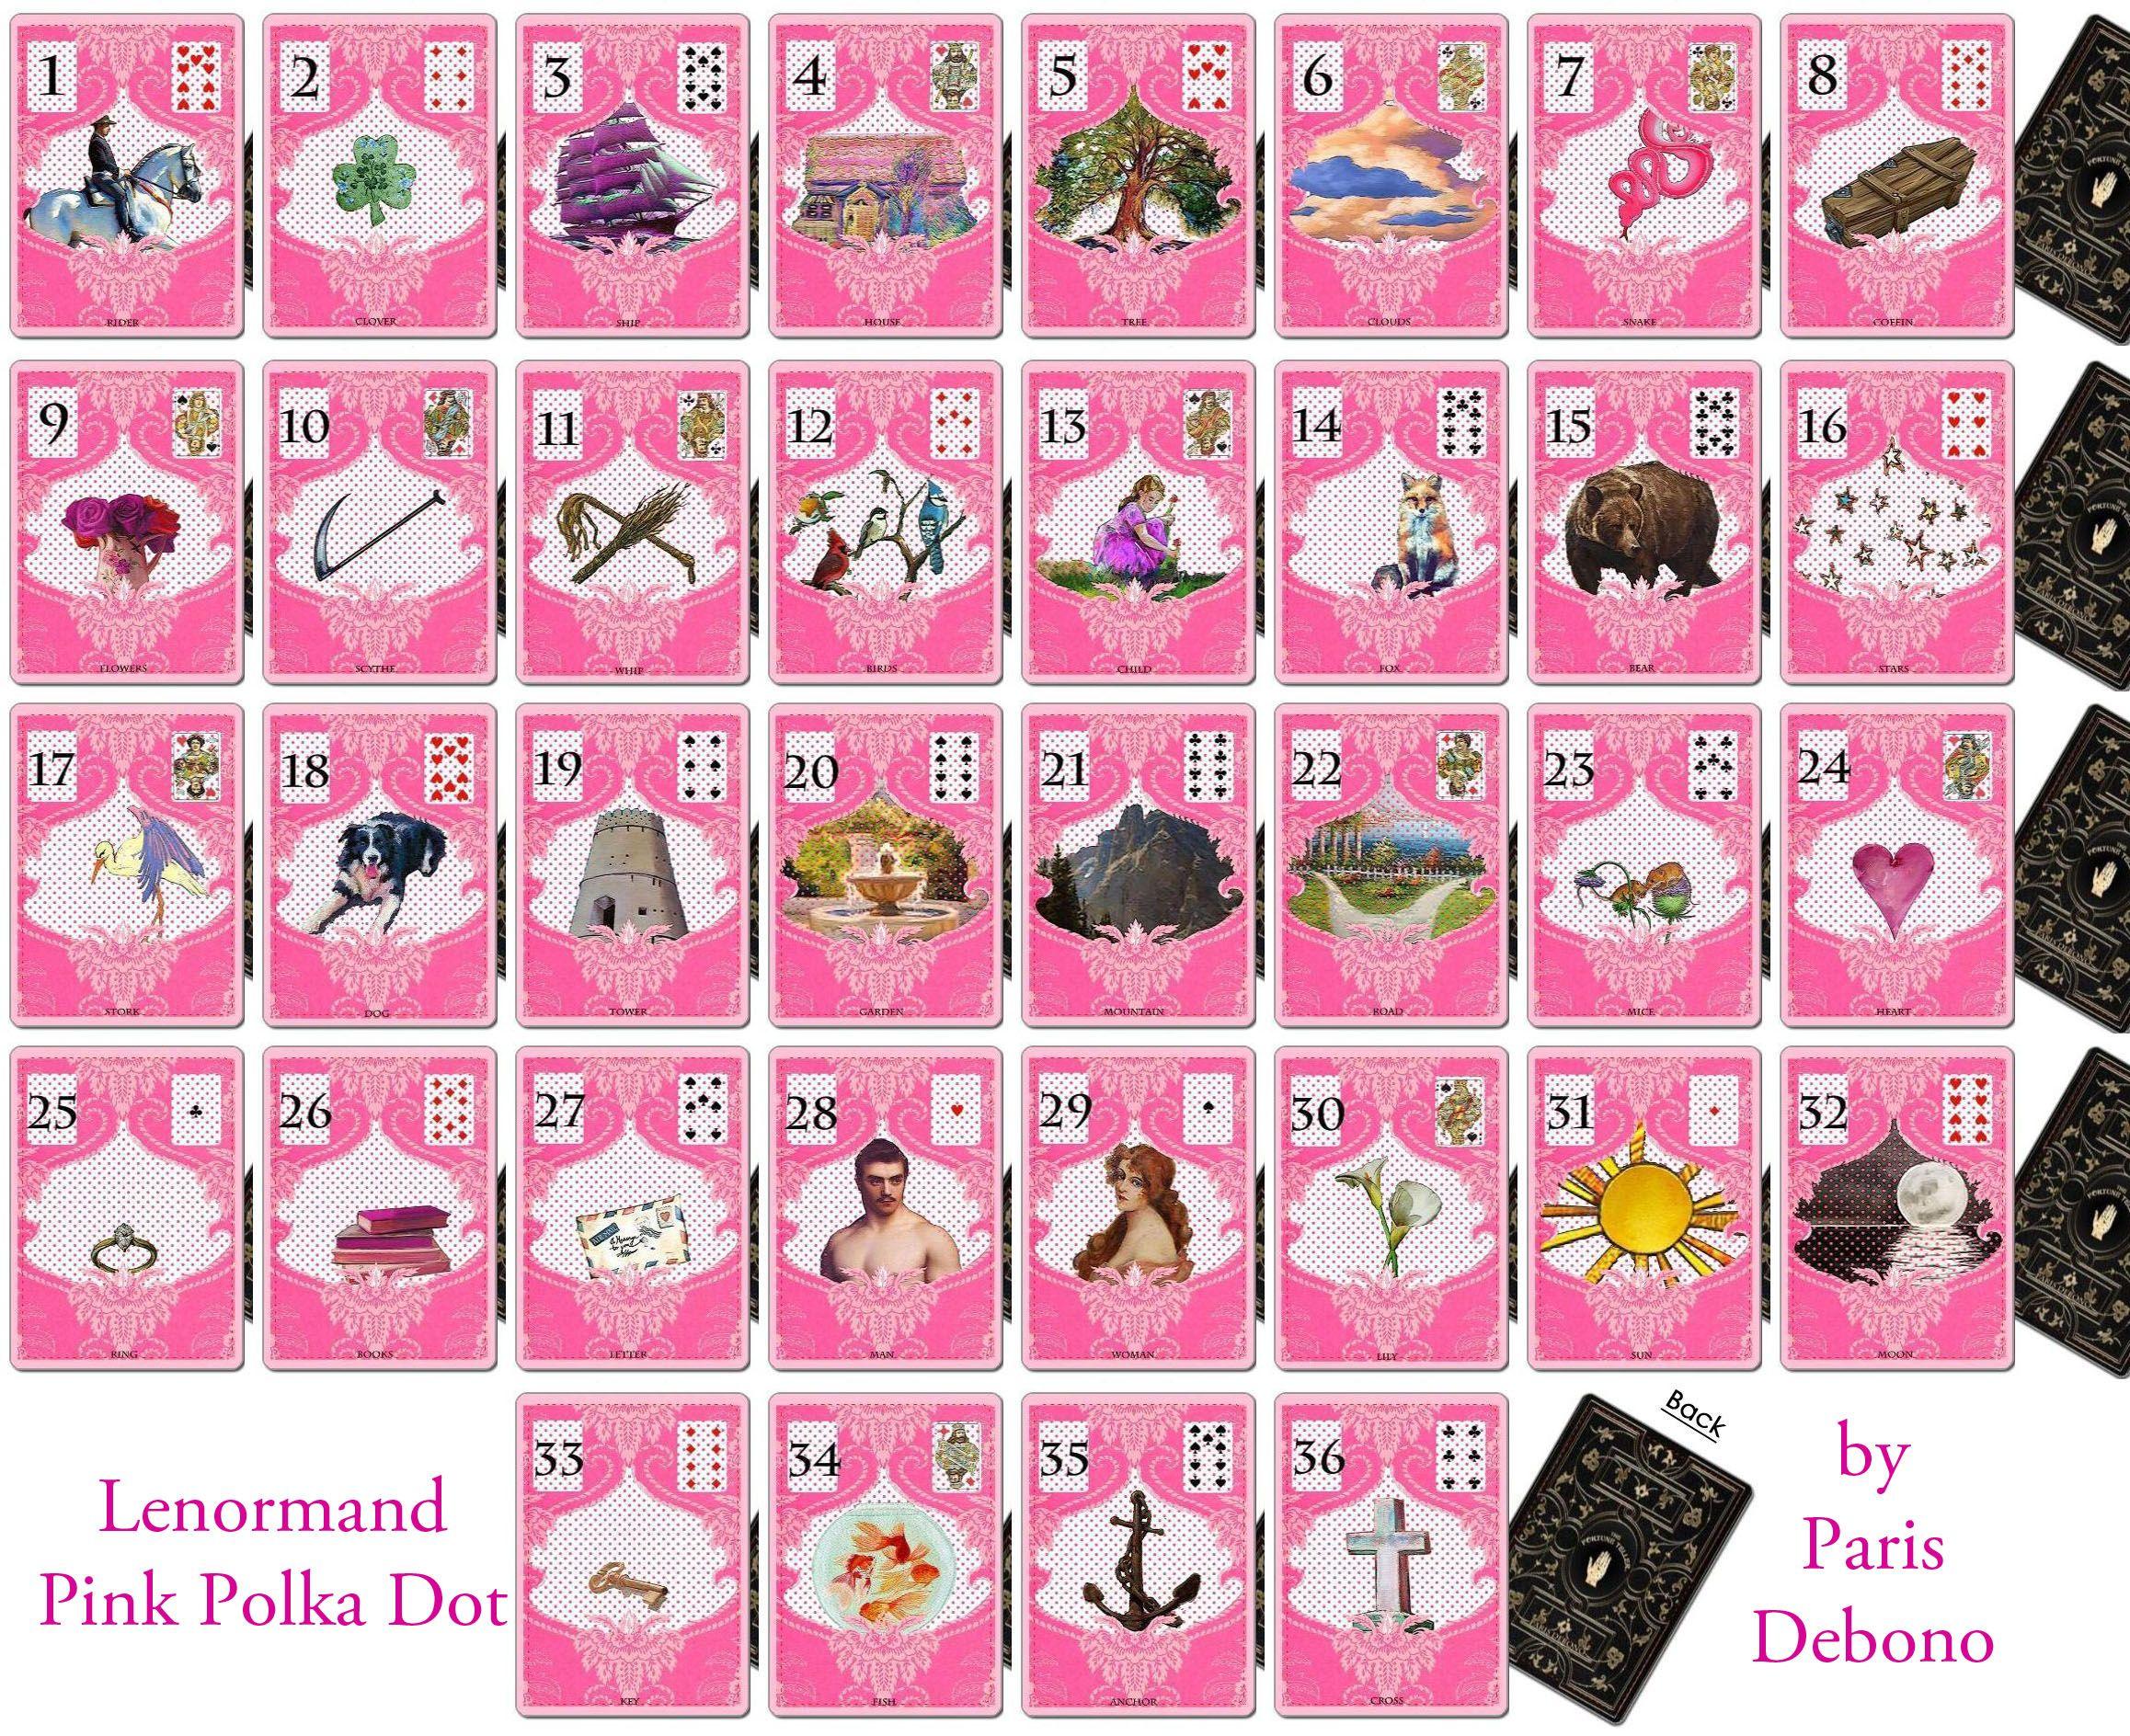 Lenormand pink deck by paris debono cartomancer